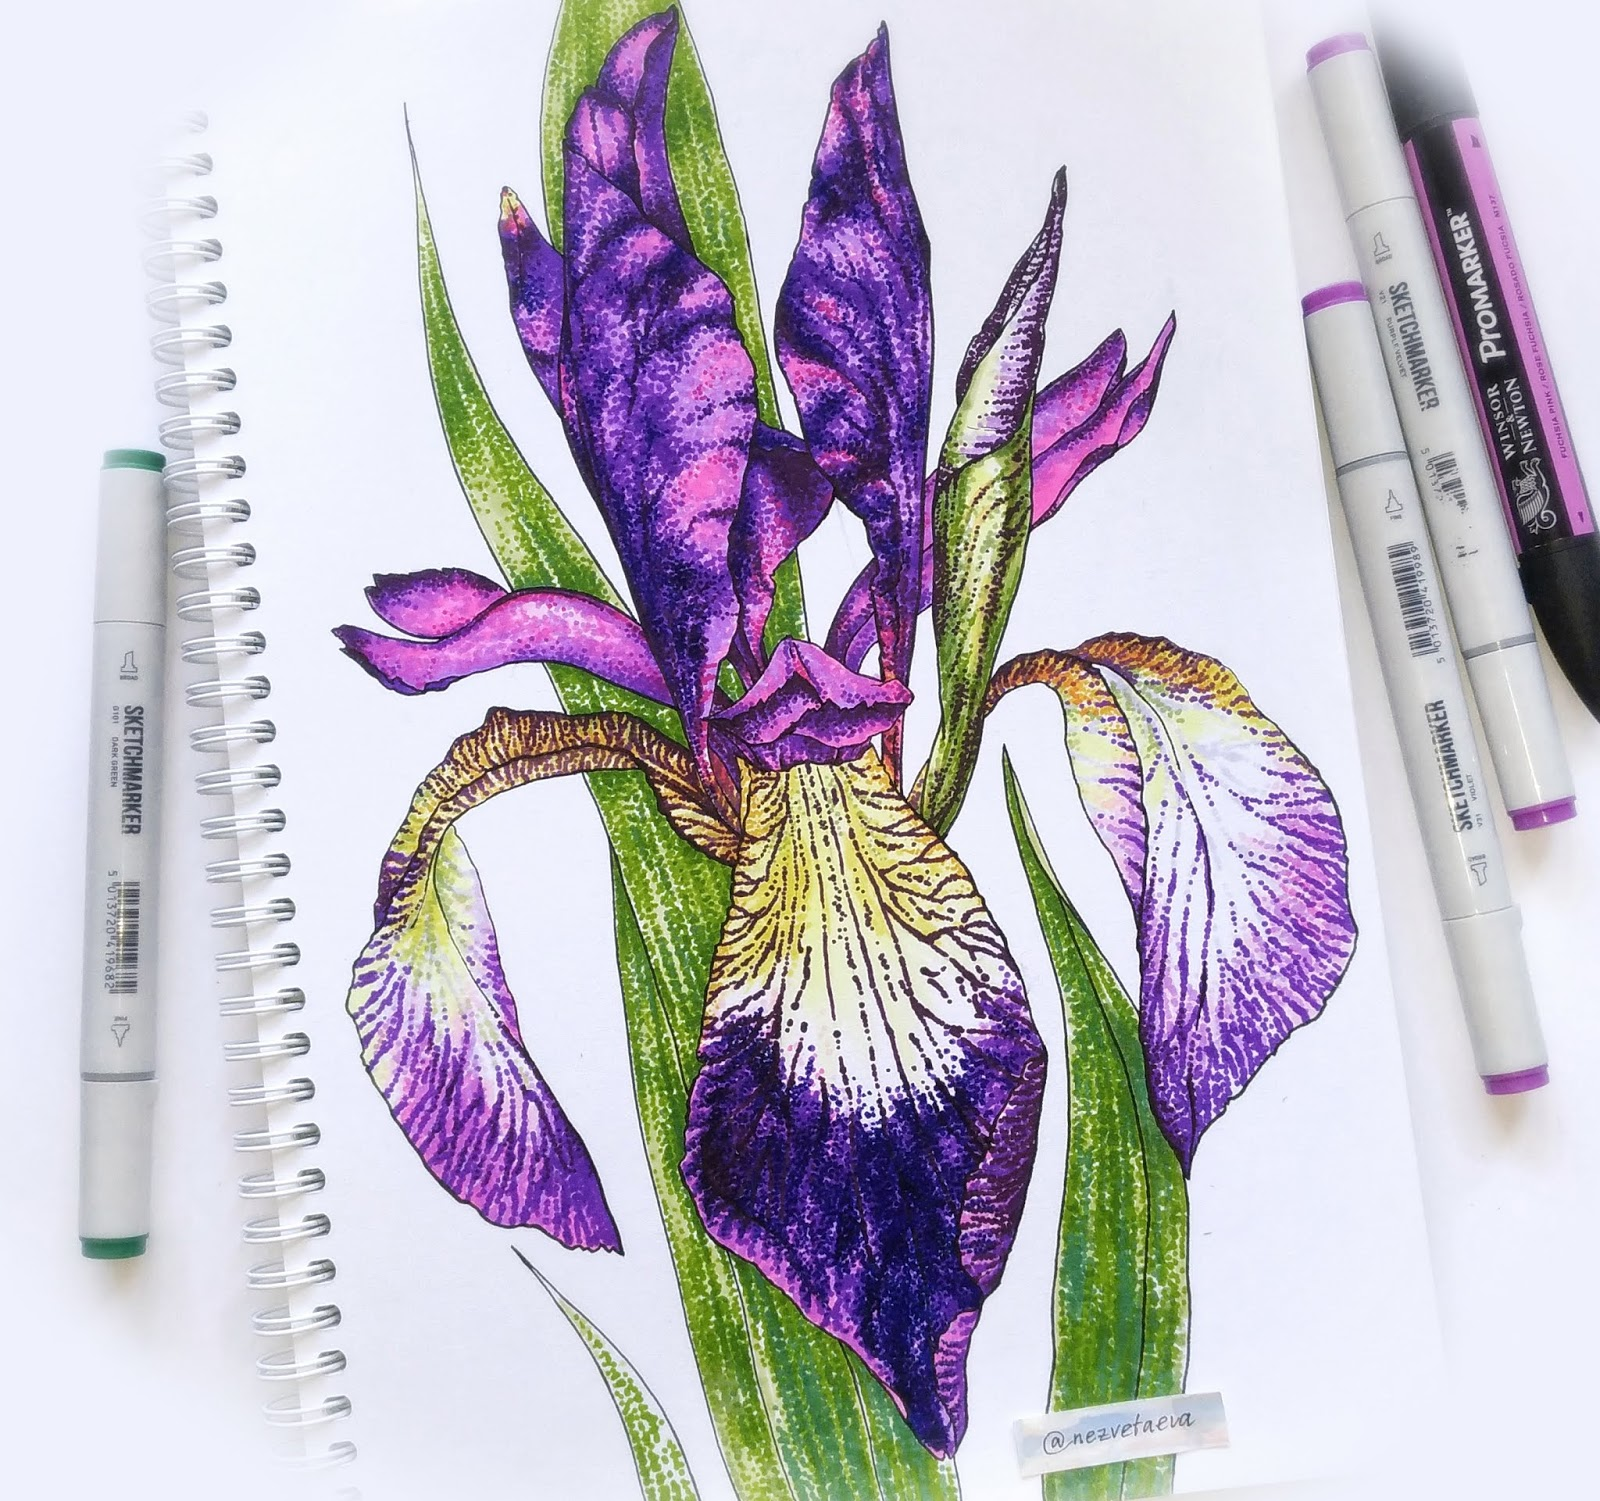 Sonia nezvetaeva, marker sketch, flower illustration, Iris, Violet, Copic, Sketchmarkers, Promarker